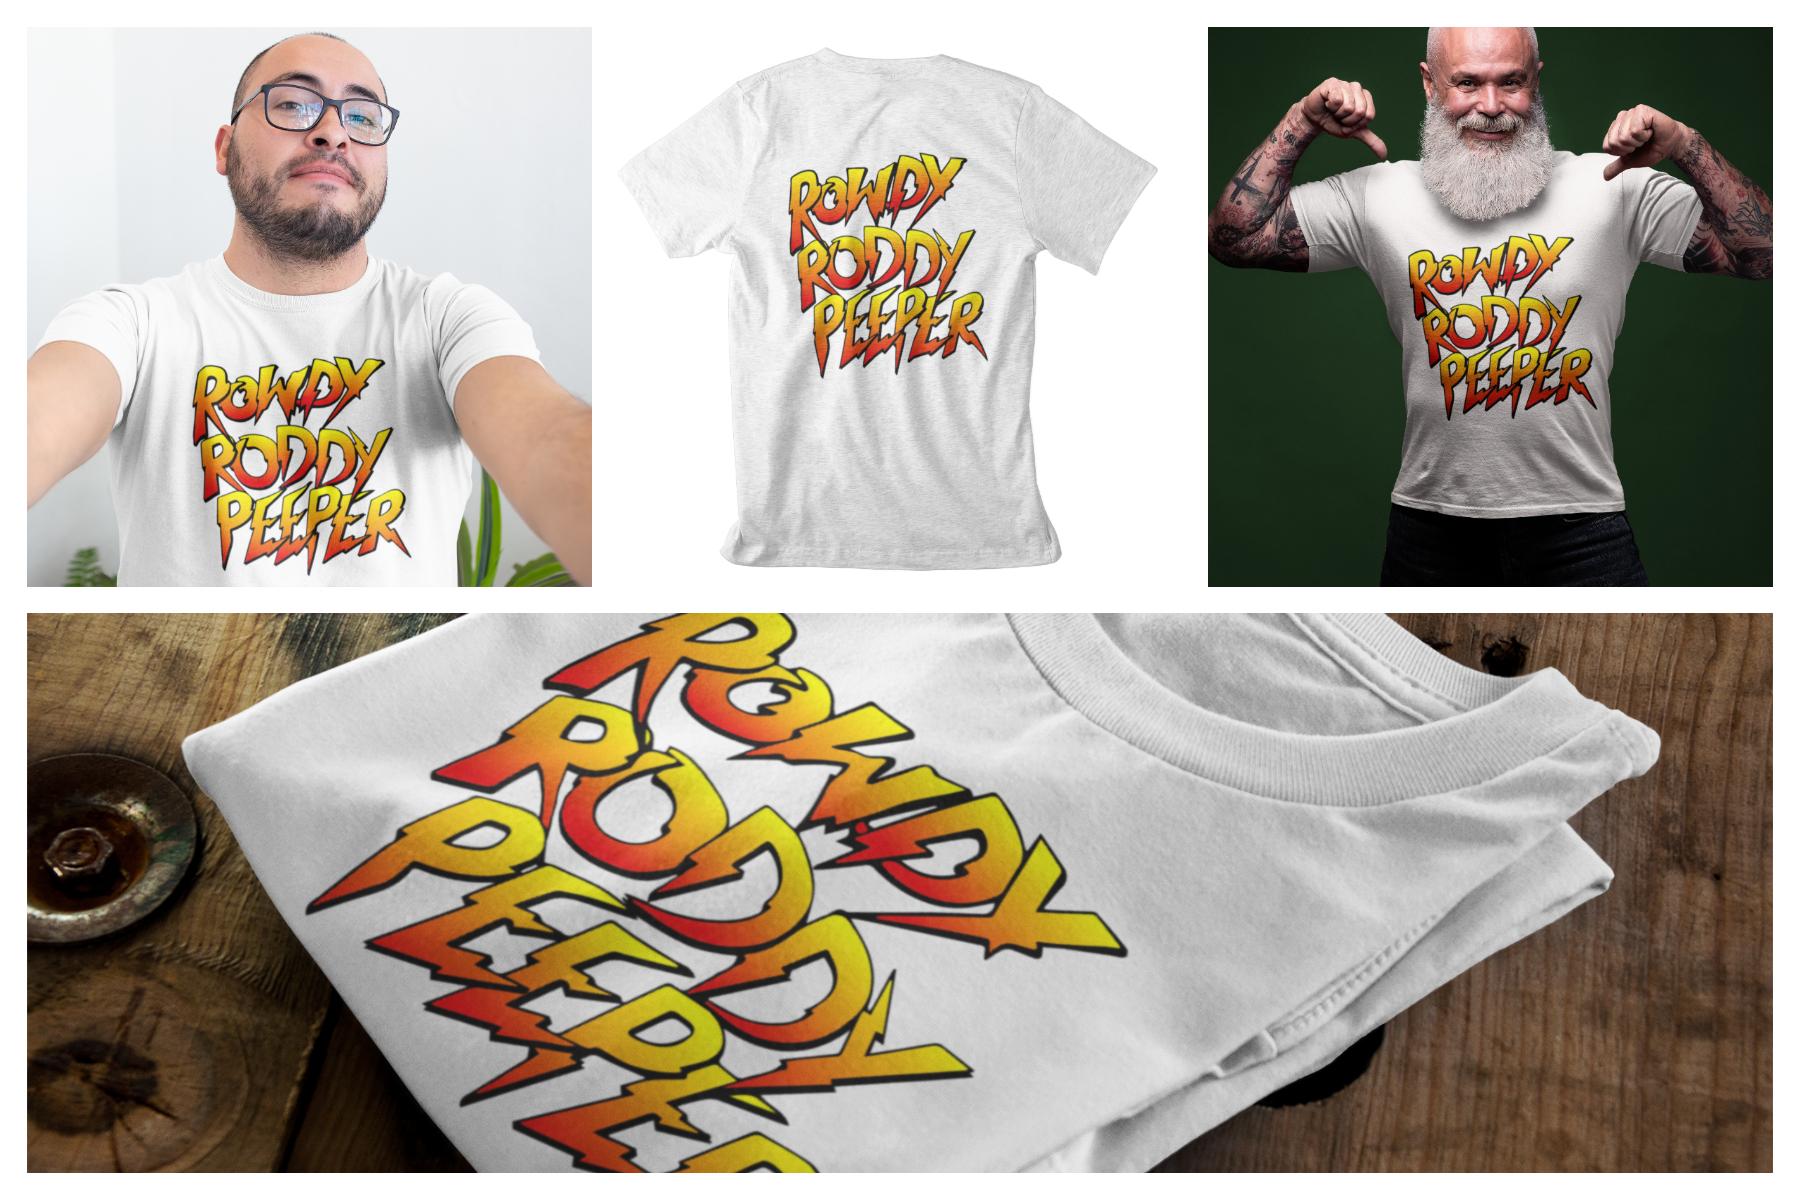 Rowdy Roddy Peeper